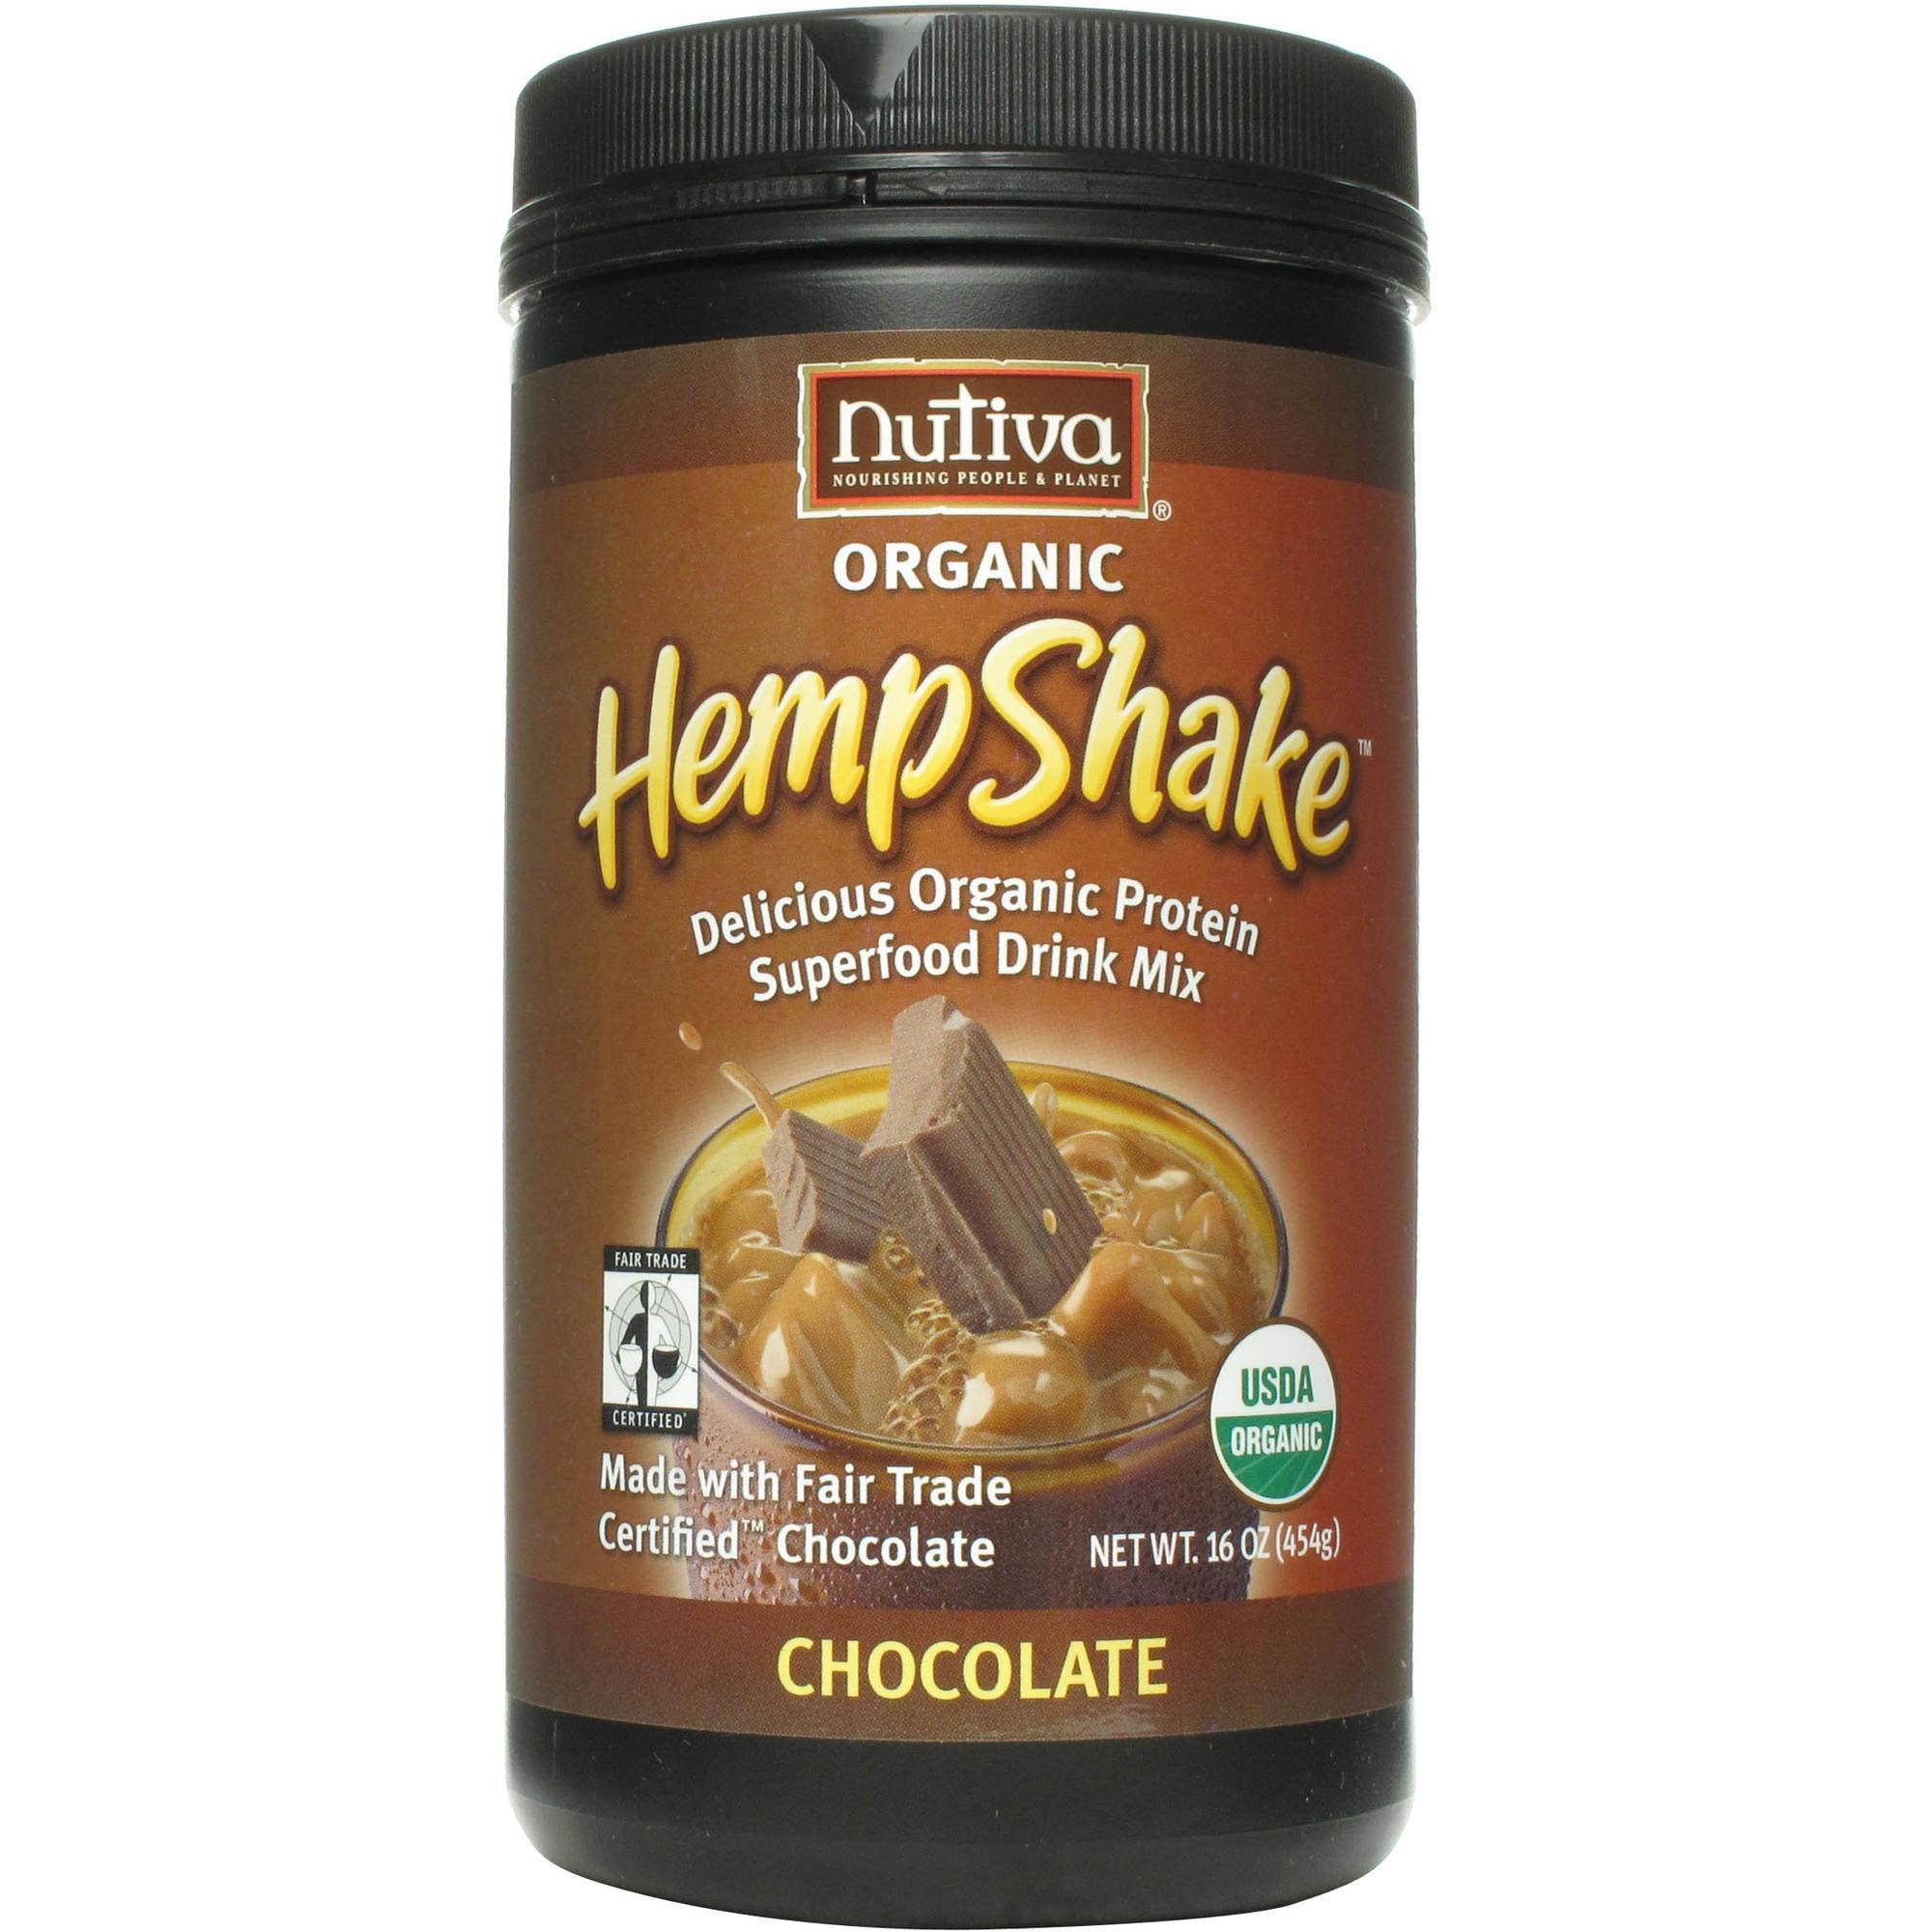 Nutiva Organic Hemp Shake Chocolate Protein Drink Mix, 16 oz